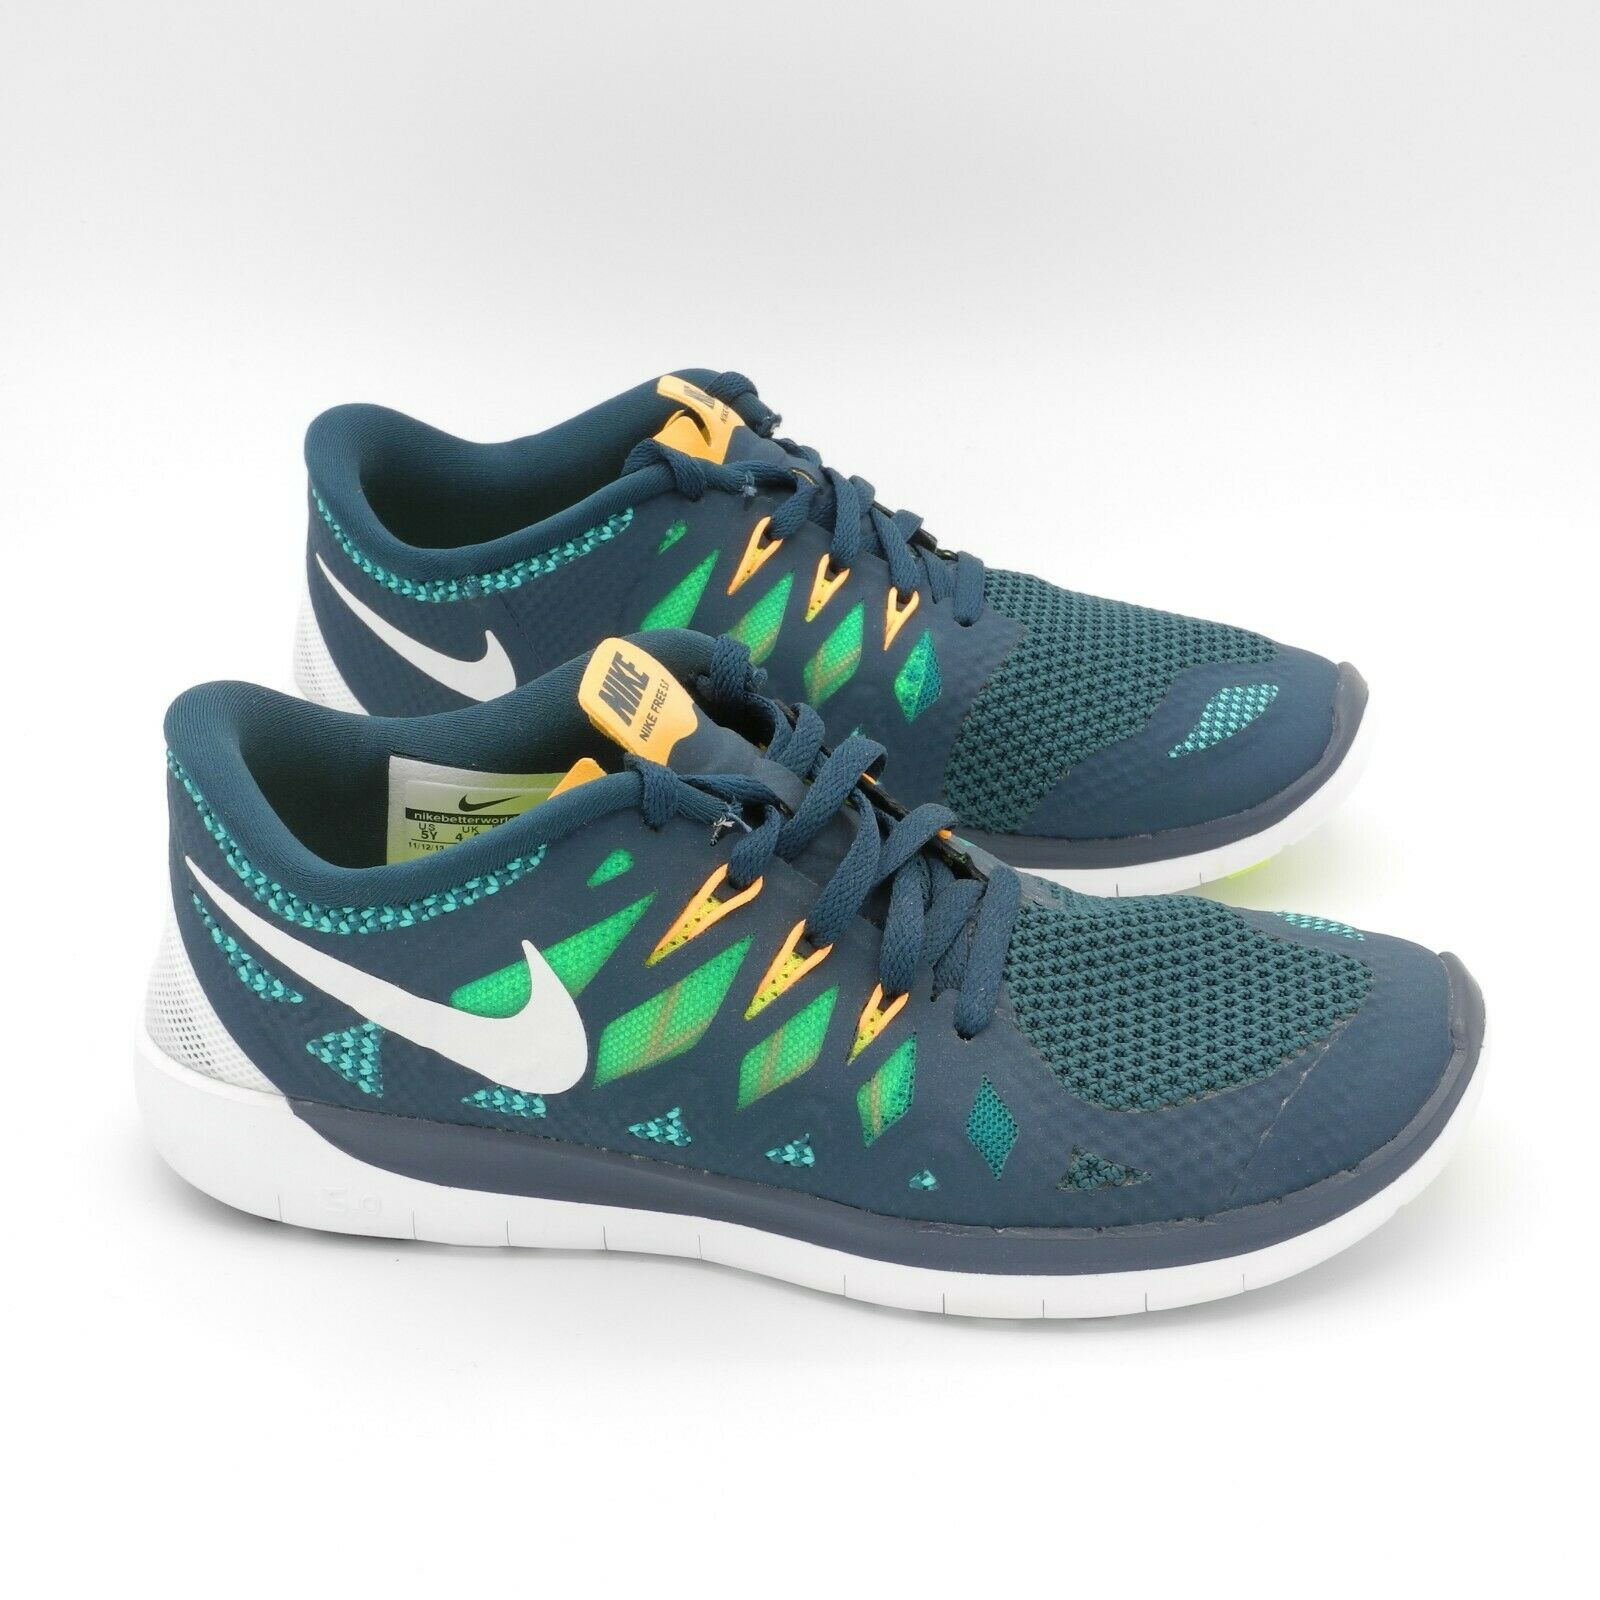 NIKE FREE 5.0 37,5 NUOVE zapatos sportive ginnastica palestra Unisex flessibili